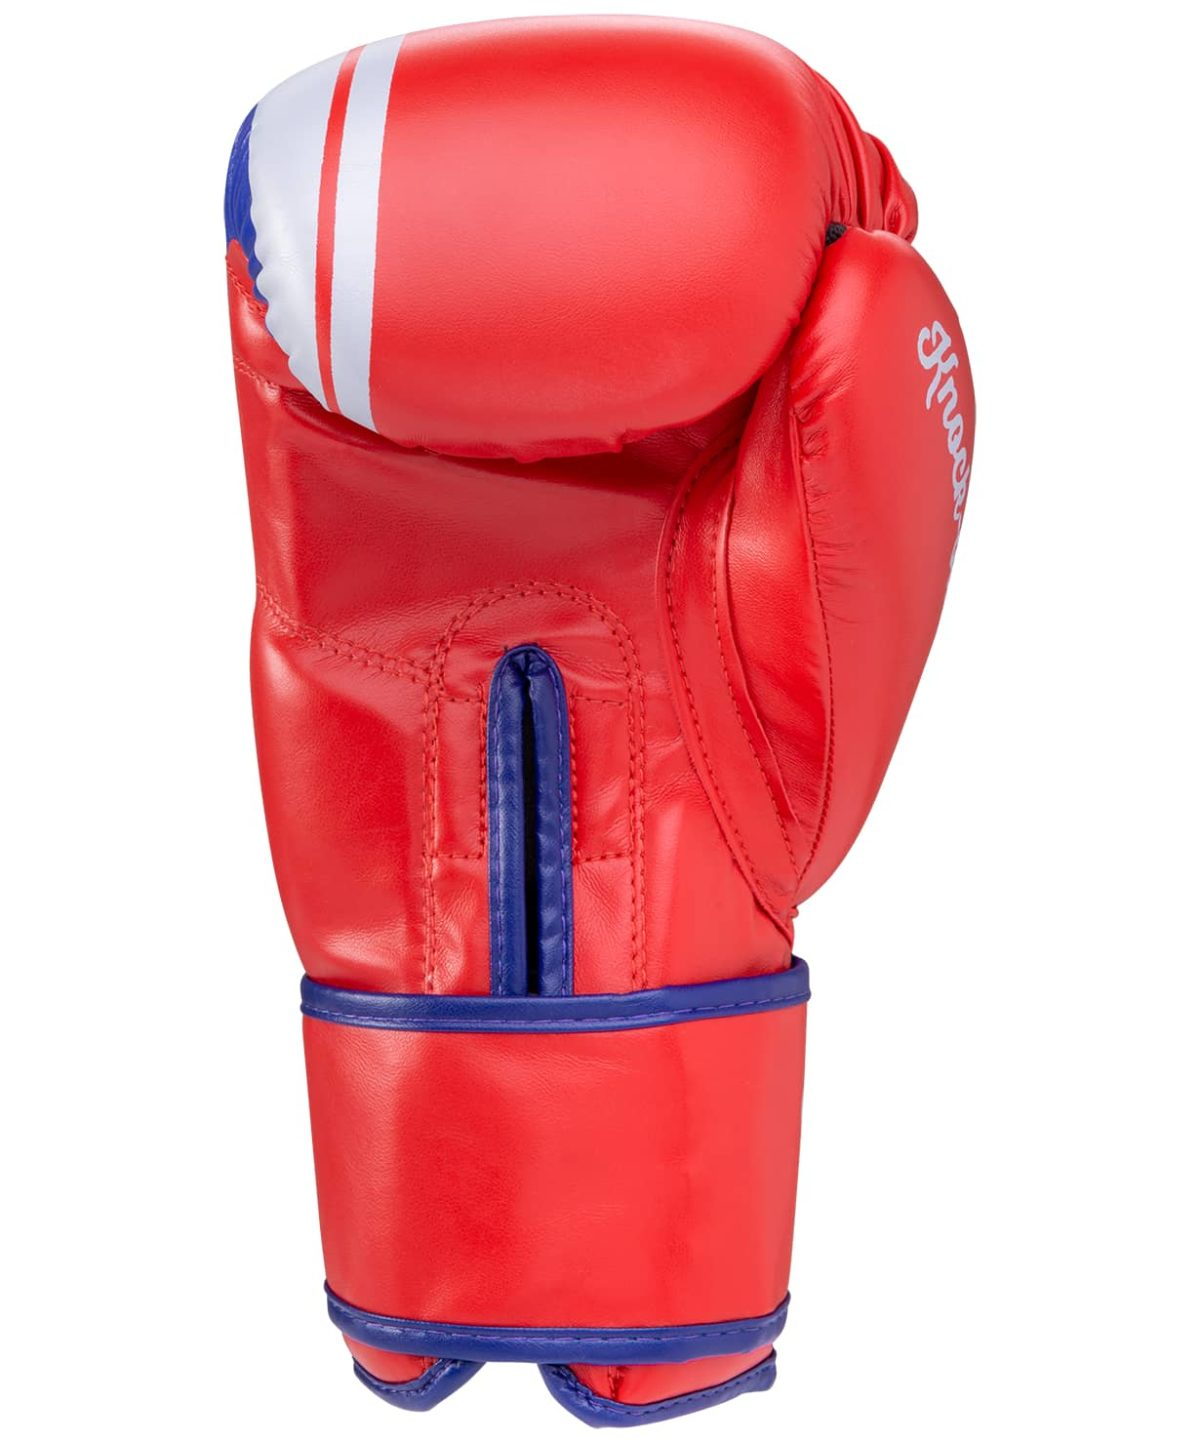 GREEN HILL Перчатки боксерские 8 oz Knockout  BGK-2266: красный - 4